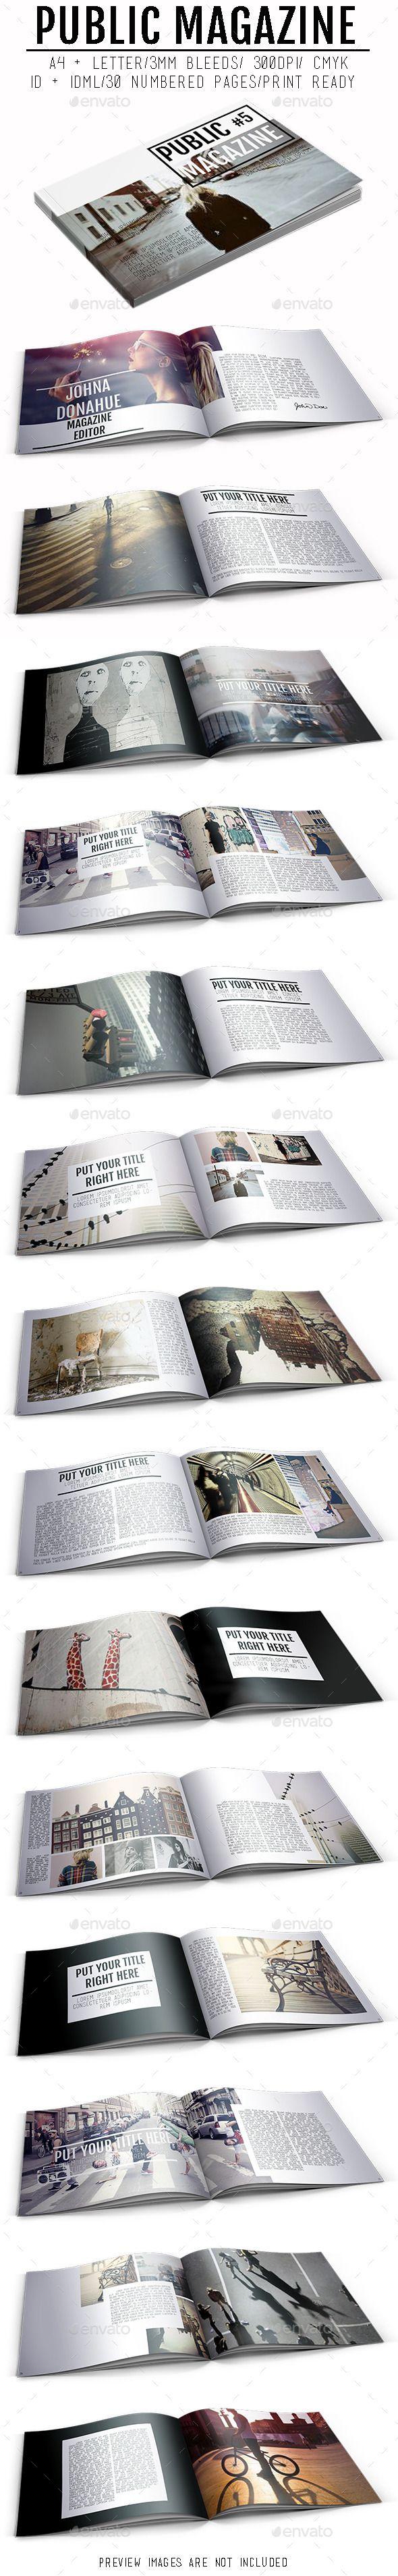 Magazine Template   #magazinetemplate   Download: http://graphicriver.net/item/public-magazine/9921786?ref=ksioks